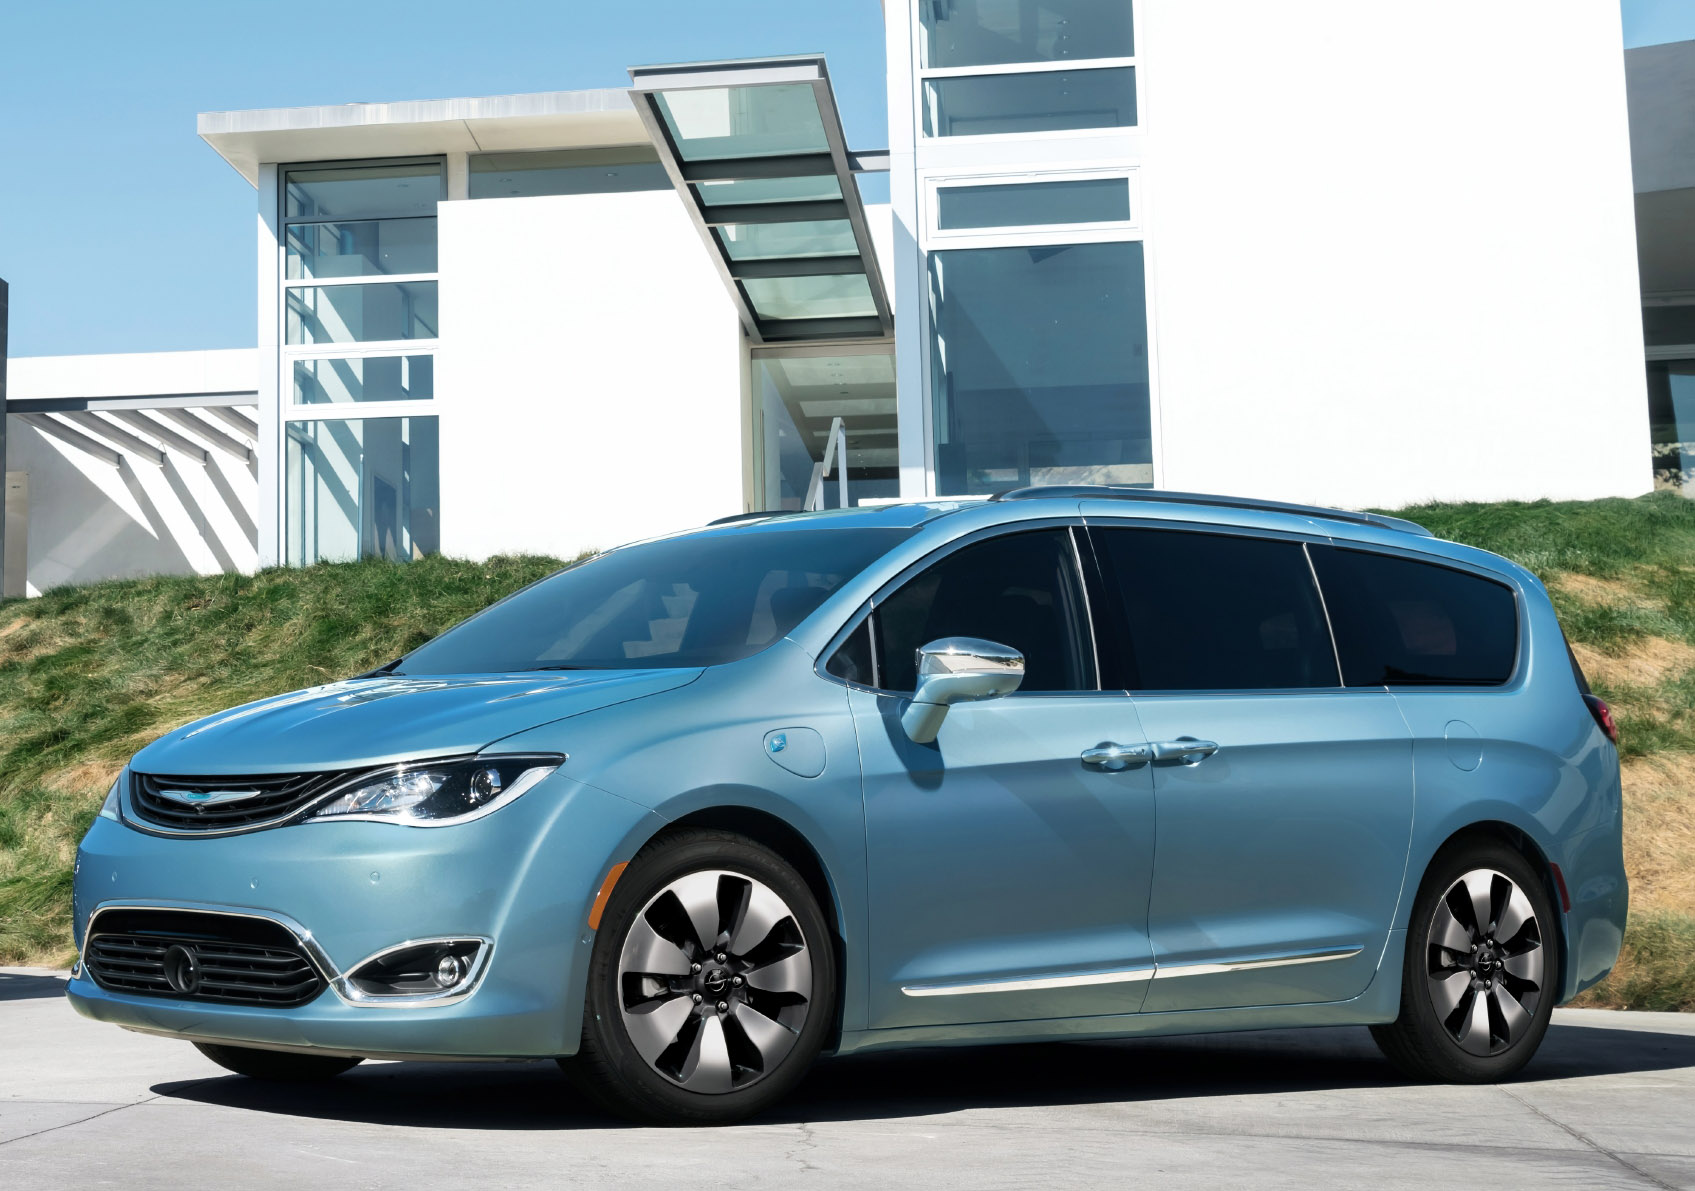 Chrysler S 2017 Pacifica Hybrid Minivan Can Go 30 Plus Miles On Battery